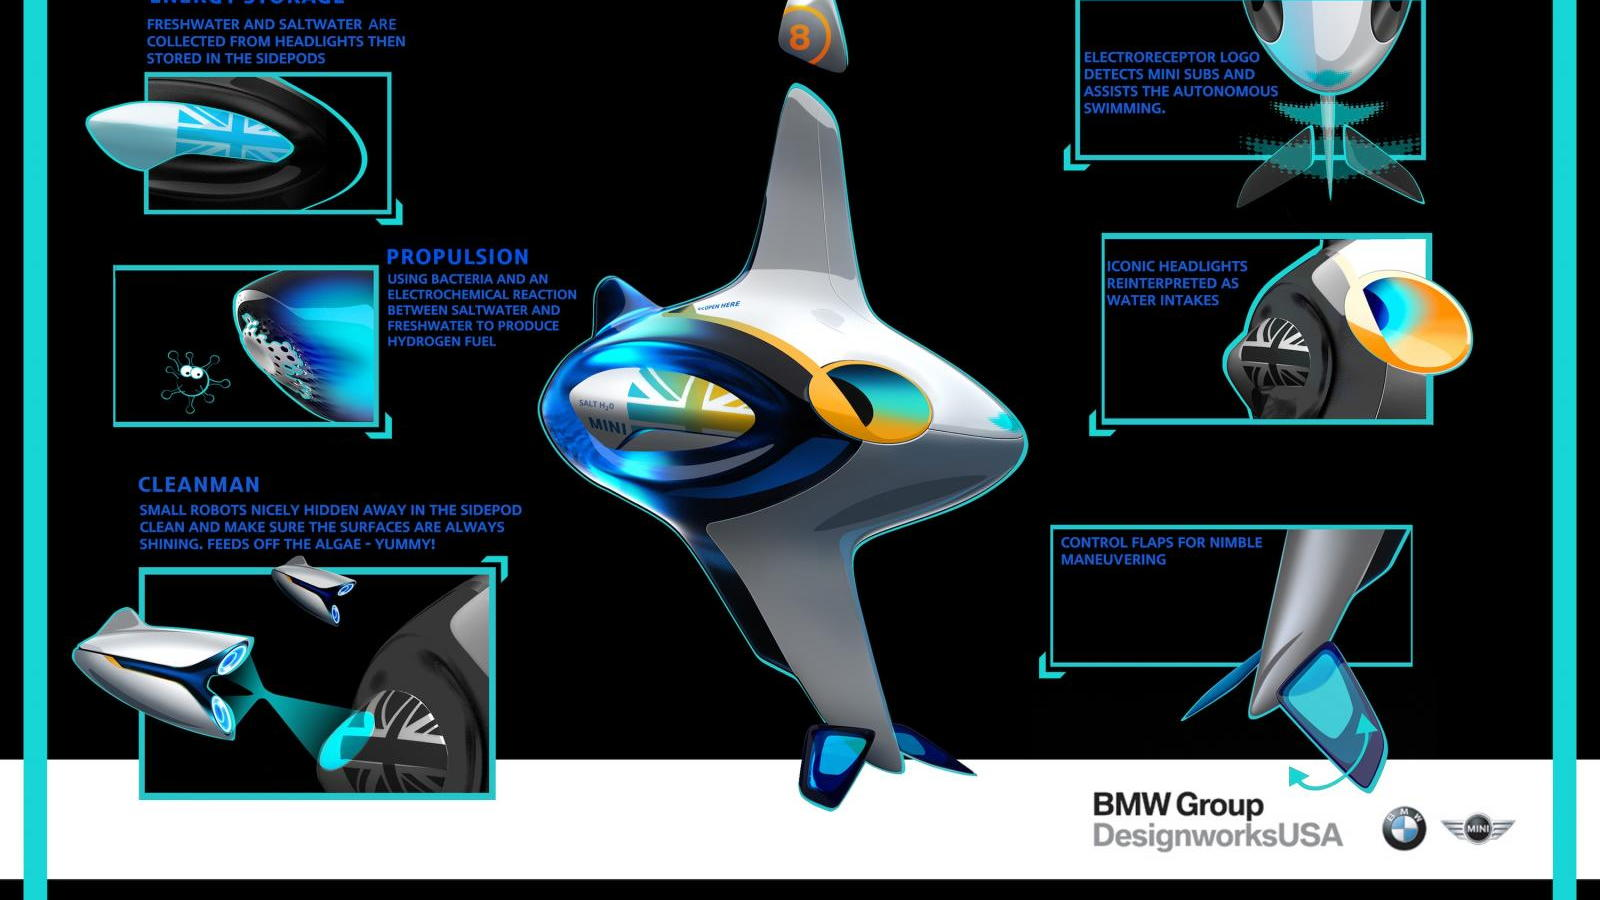 BMW Group DesignworksUSA L.A. Subways, Los Angeles Auto Show Design Challenge